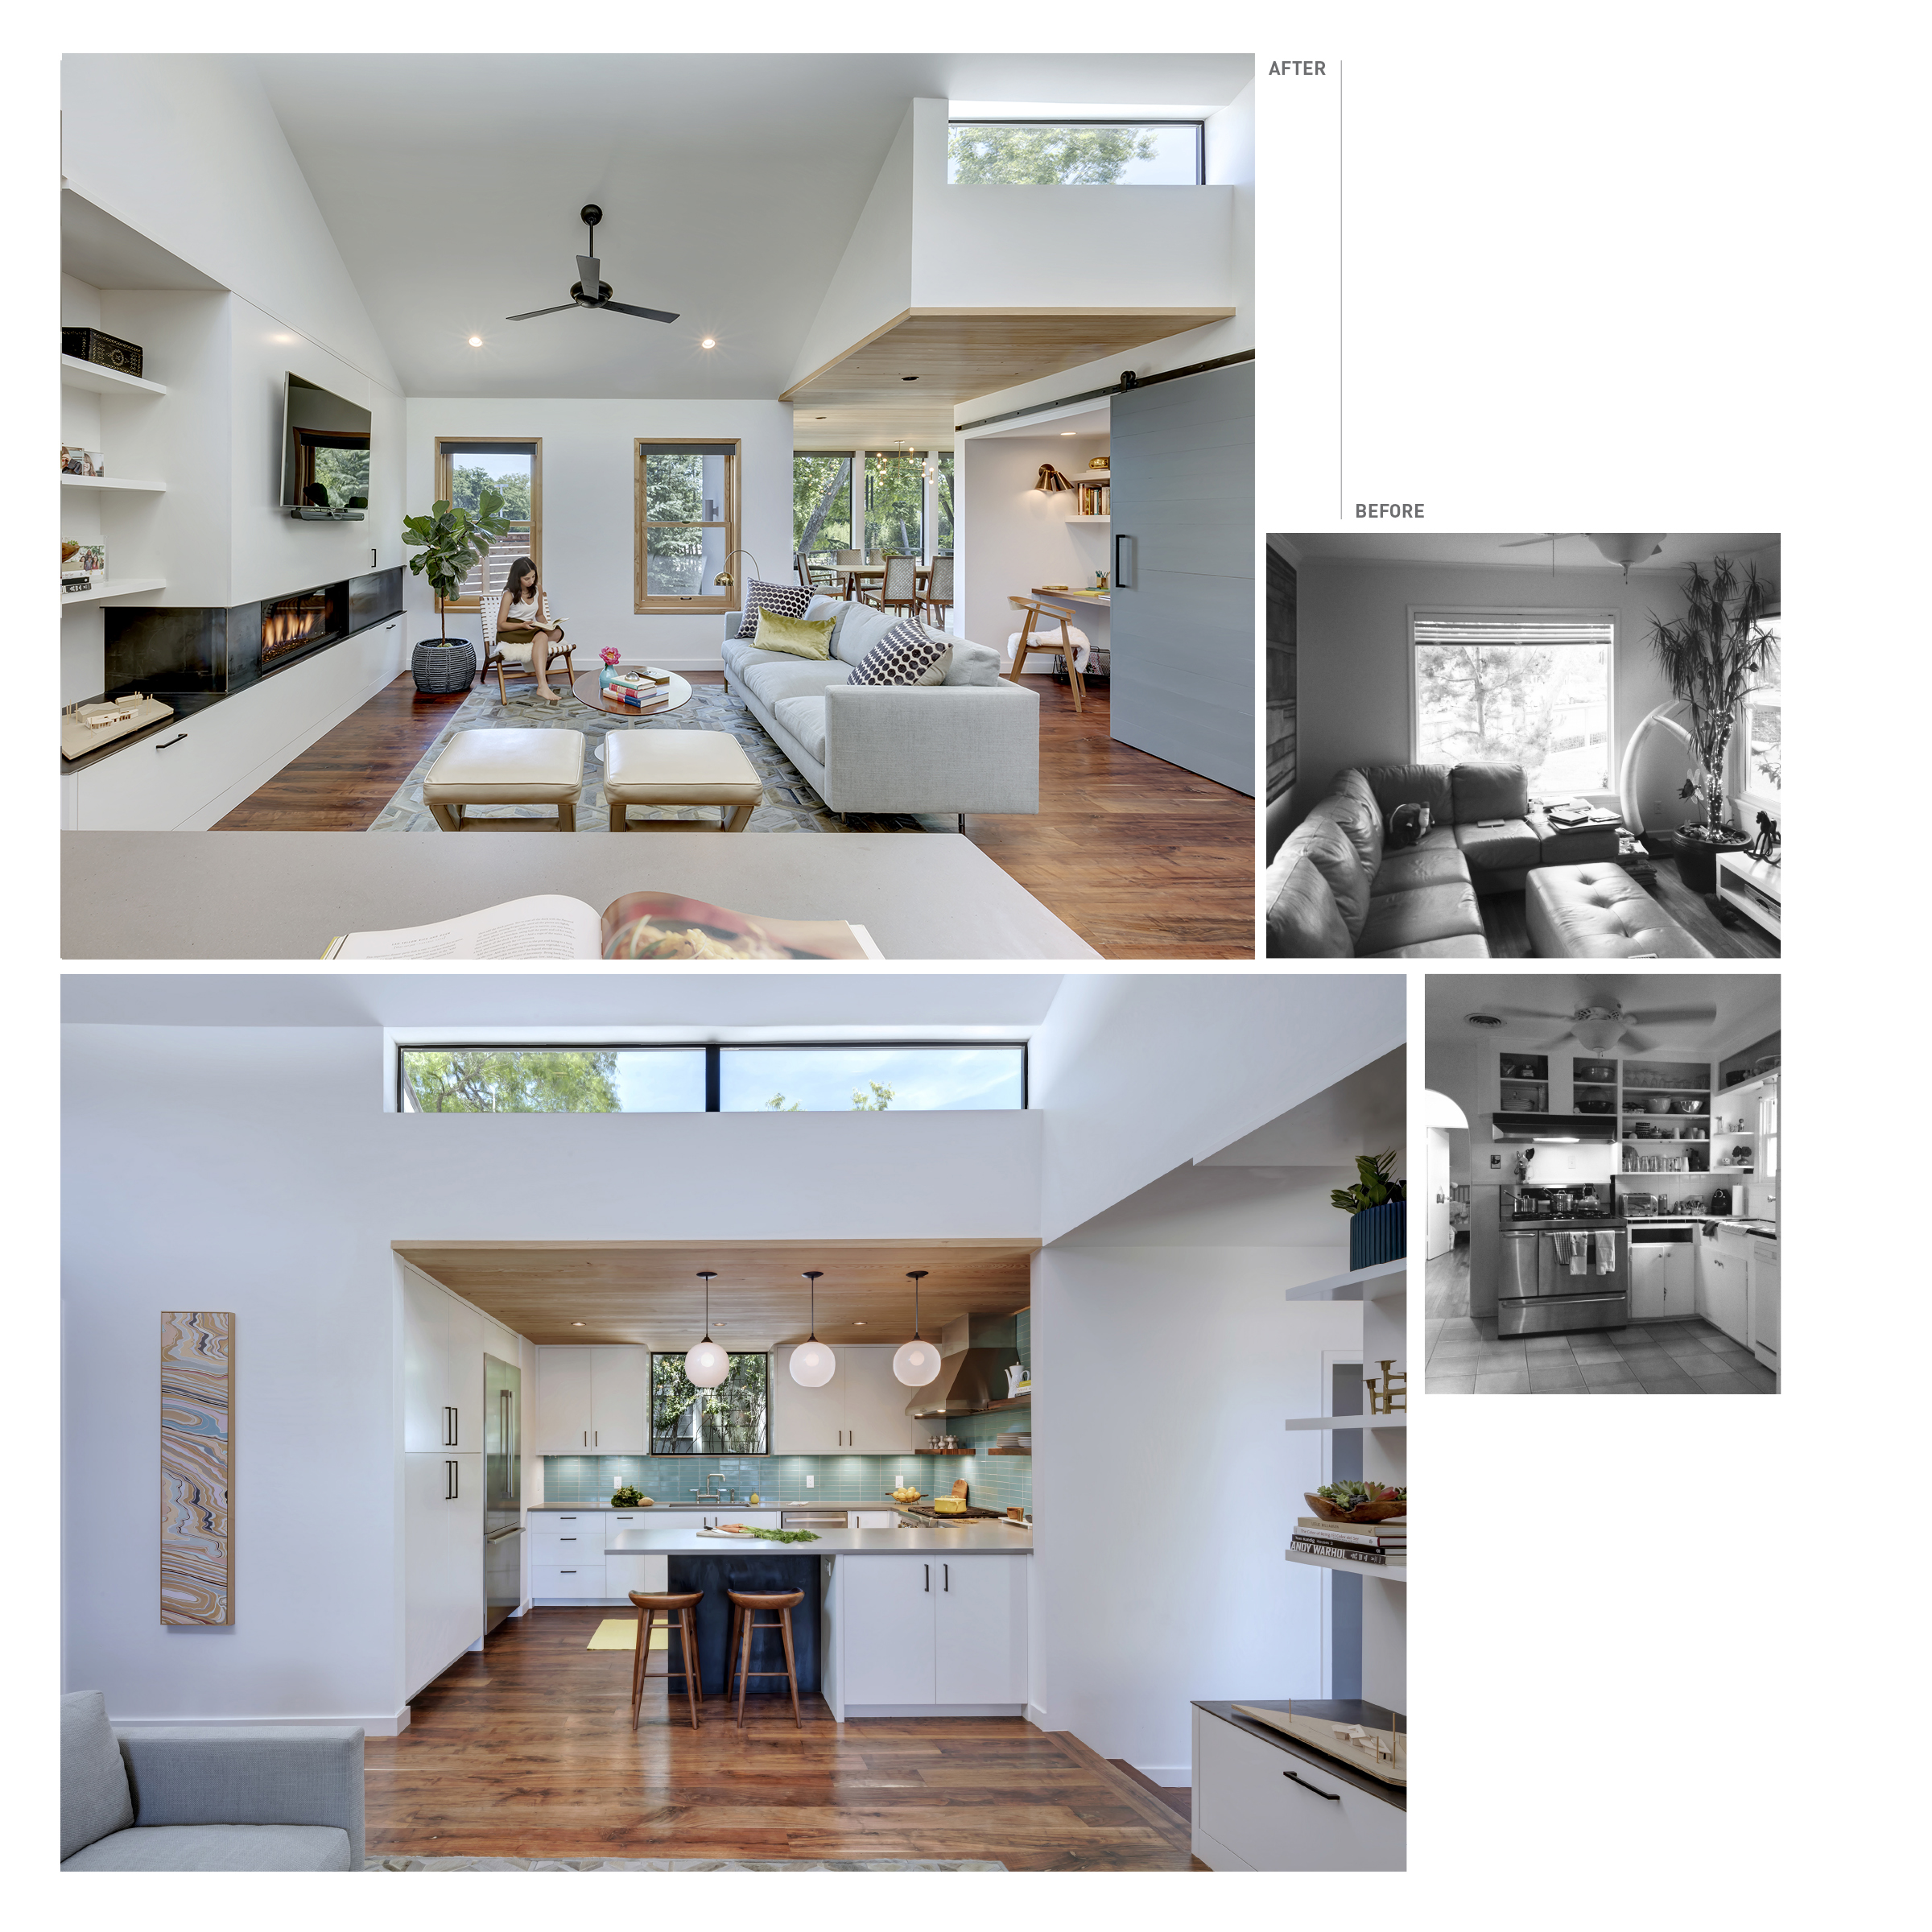 Interlock House by Matt Fajkus MF Architecture_before+after.jpg